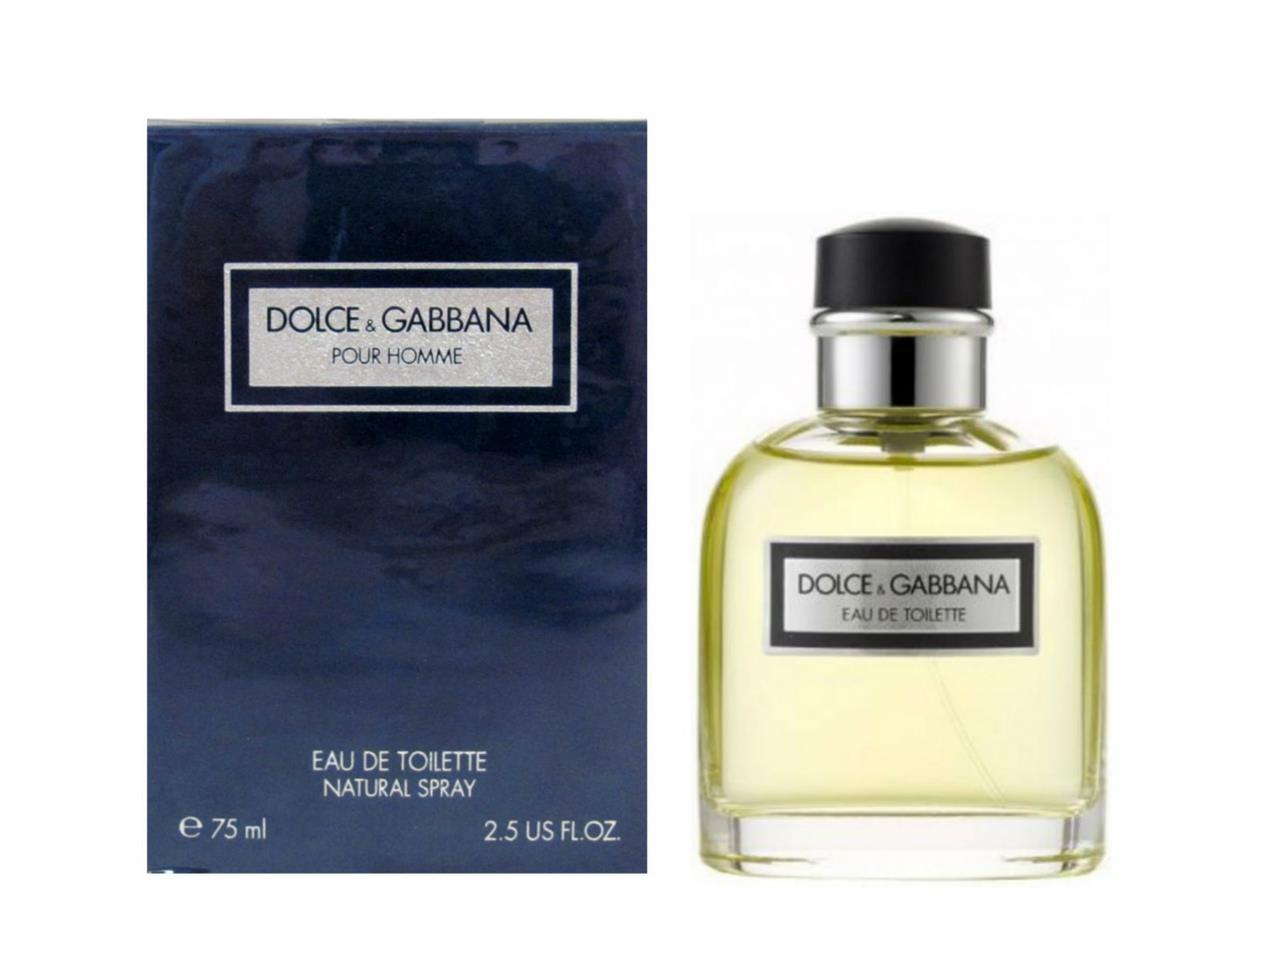 dolce gabbana pour homme vintage made in italy 2 5 oz eau de toilette spray ebay. Black Bedroom Furniture Sets. Home Design Ideas